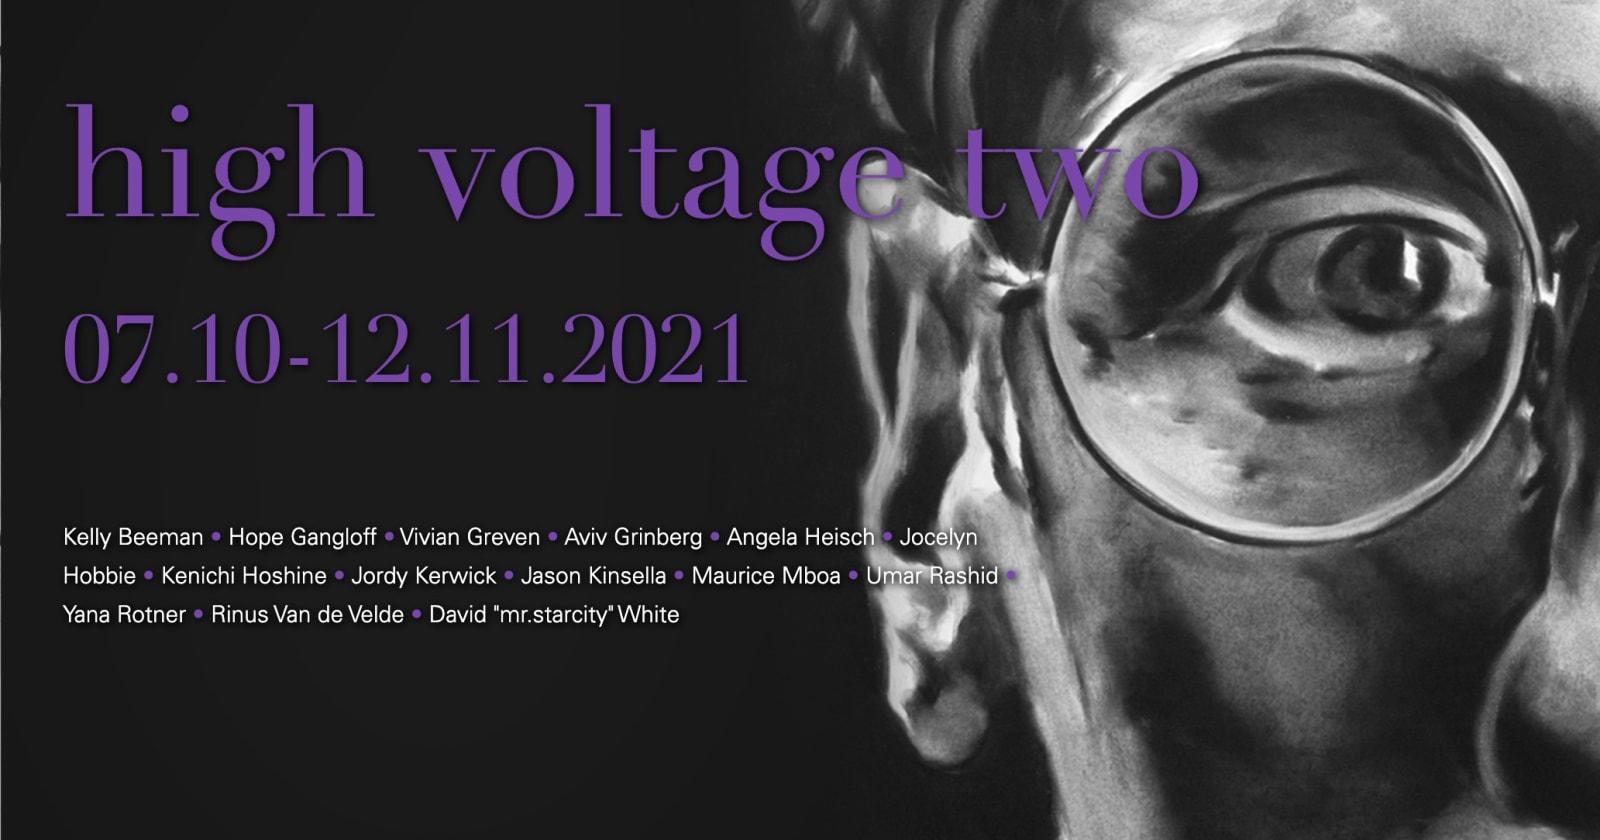 07 October 2021 Hope Gangloff is included in High Voltage II at Nassima Landau, Tel Aviv See More